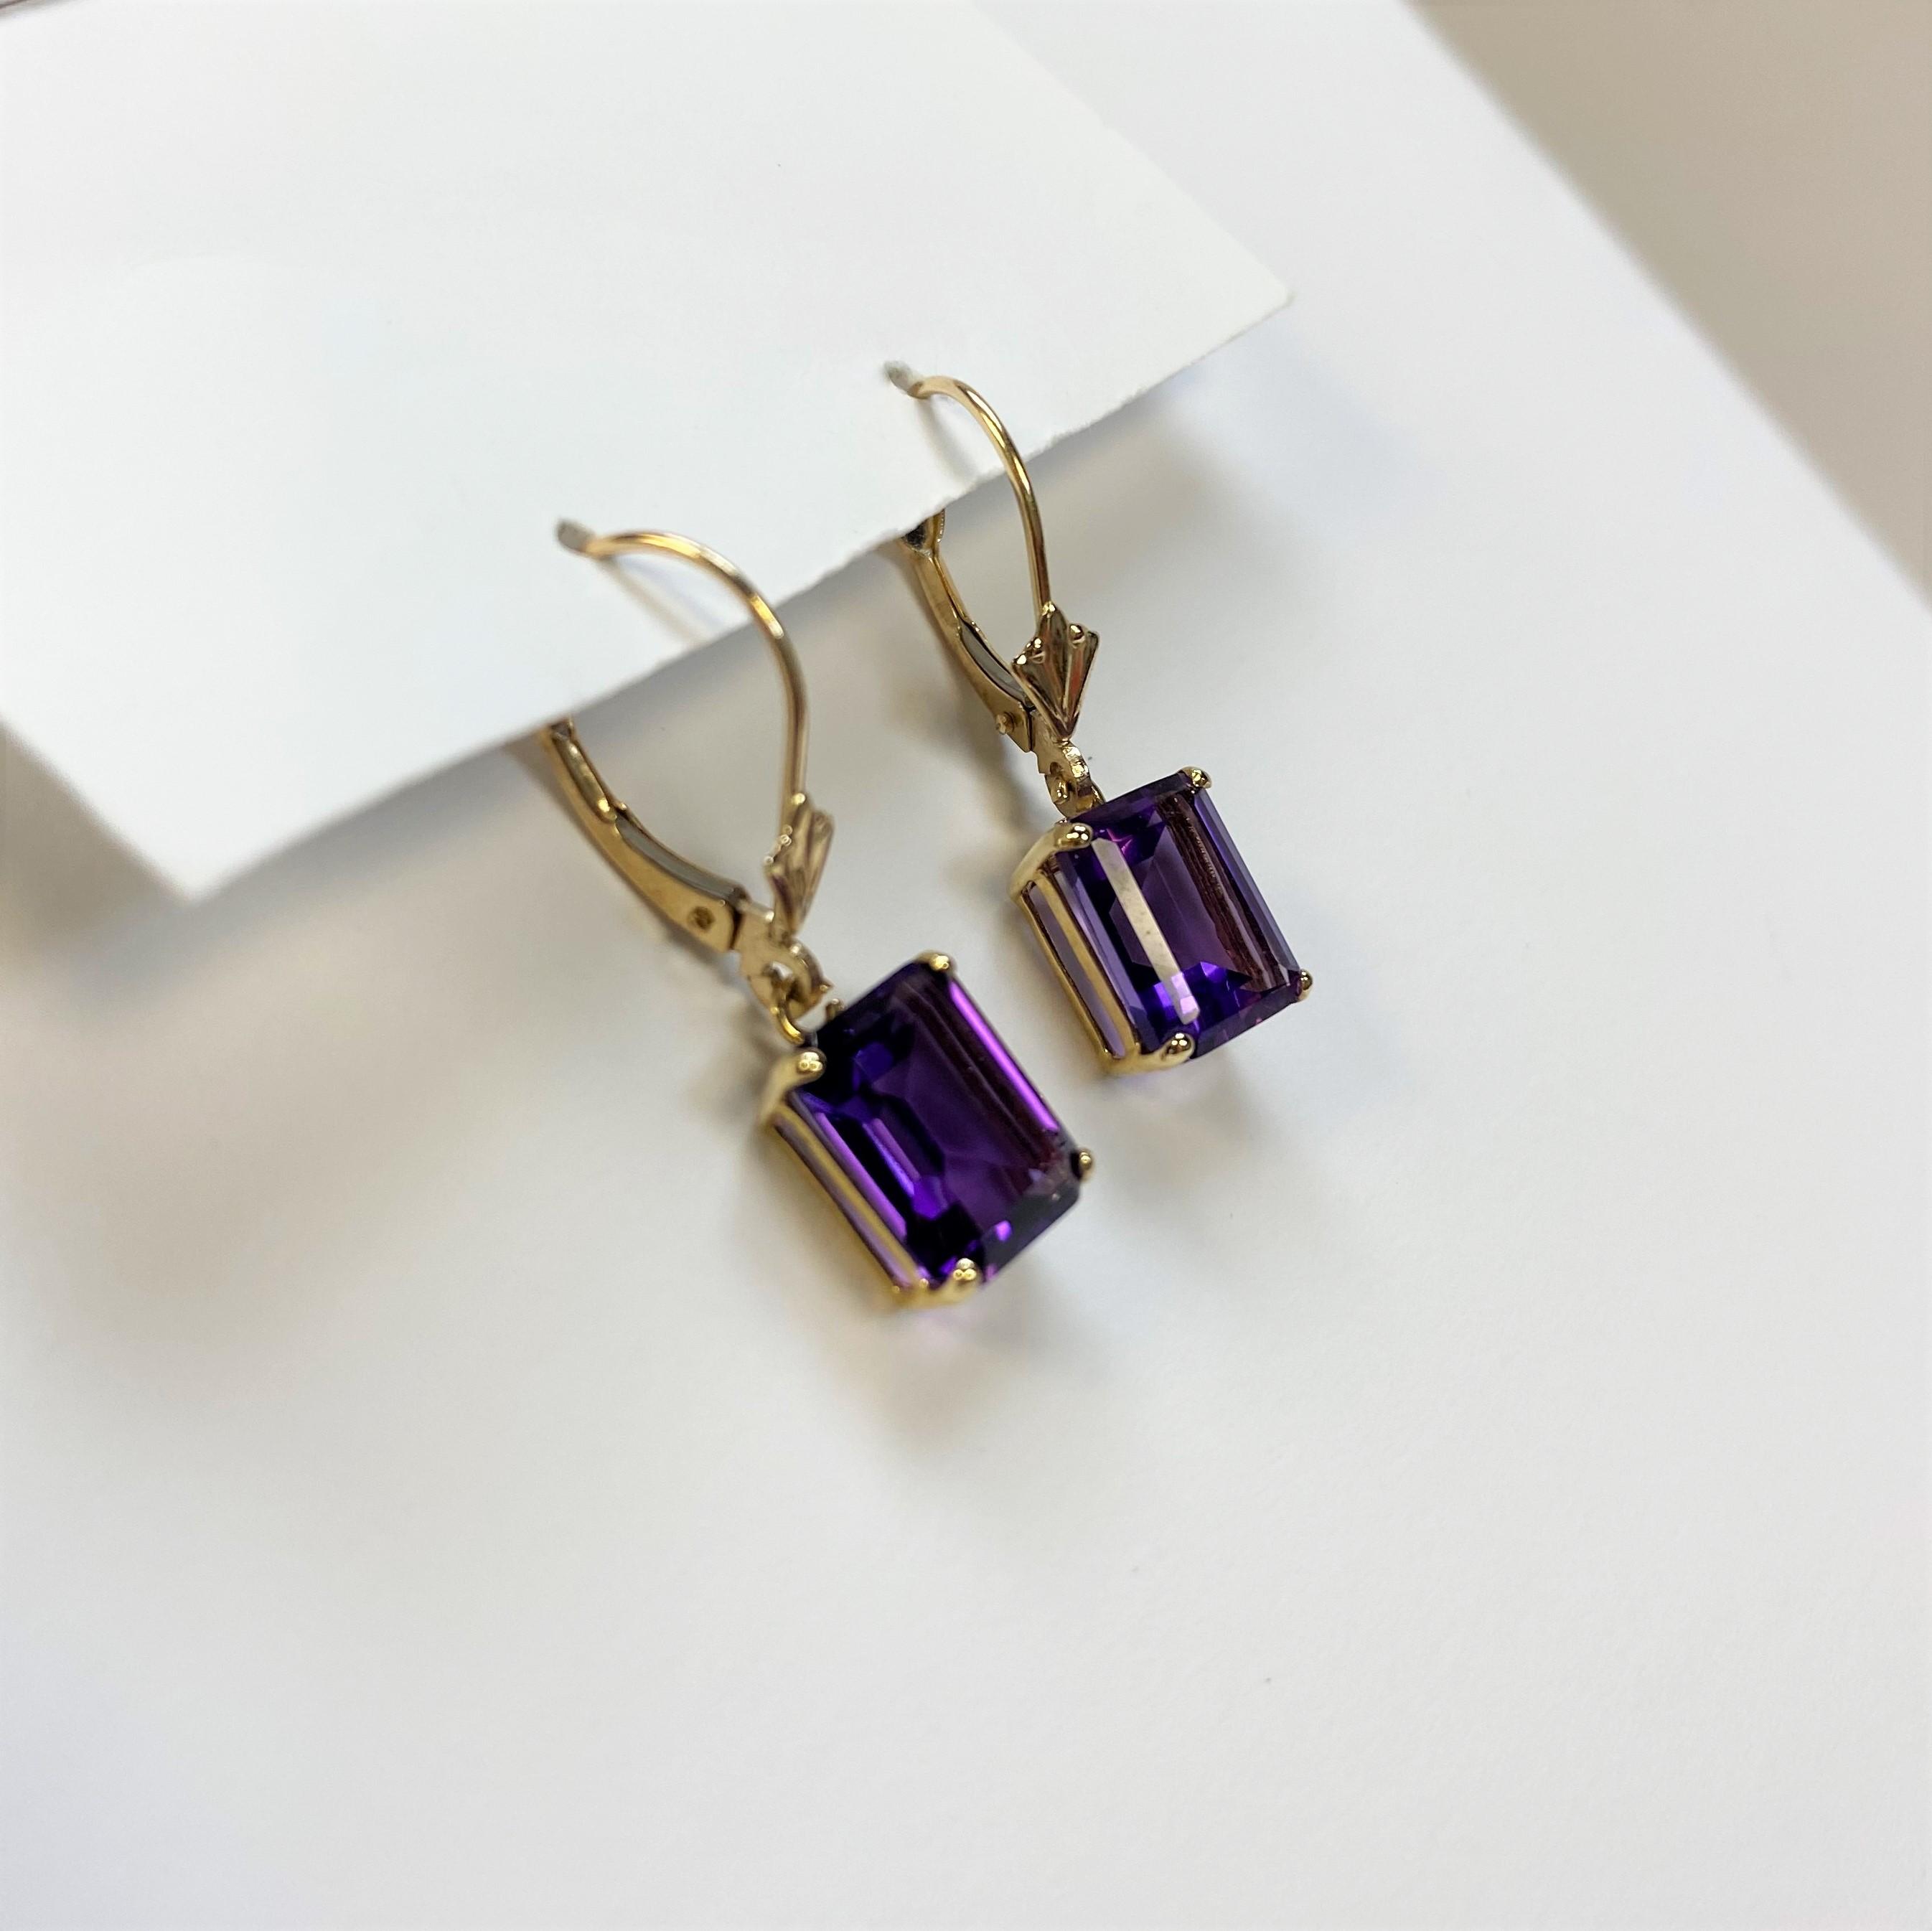 3.0 Carats Amethyst Yellow Gold Earrings